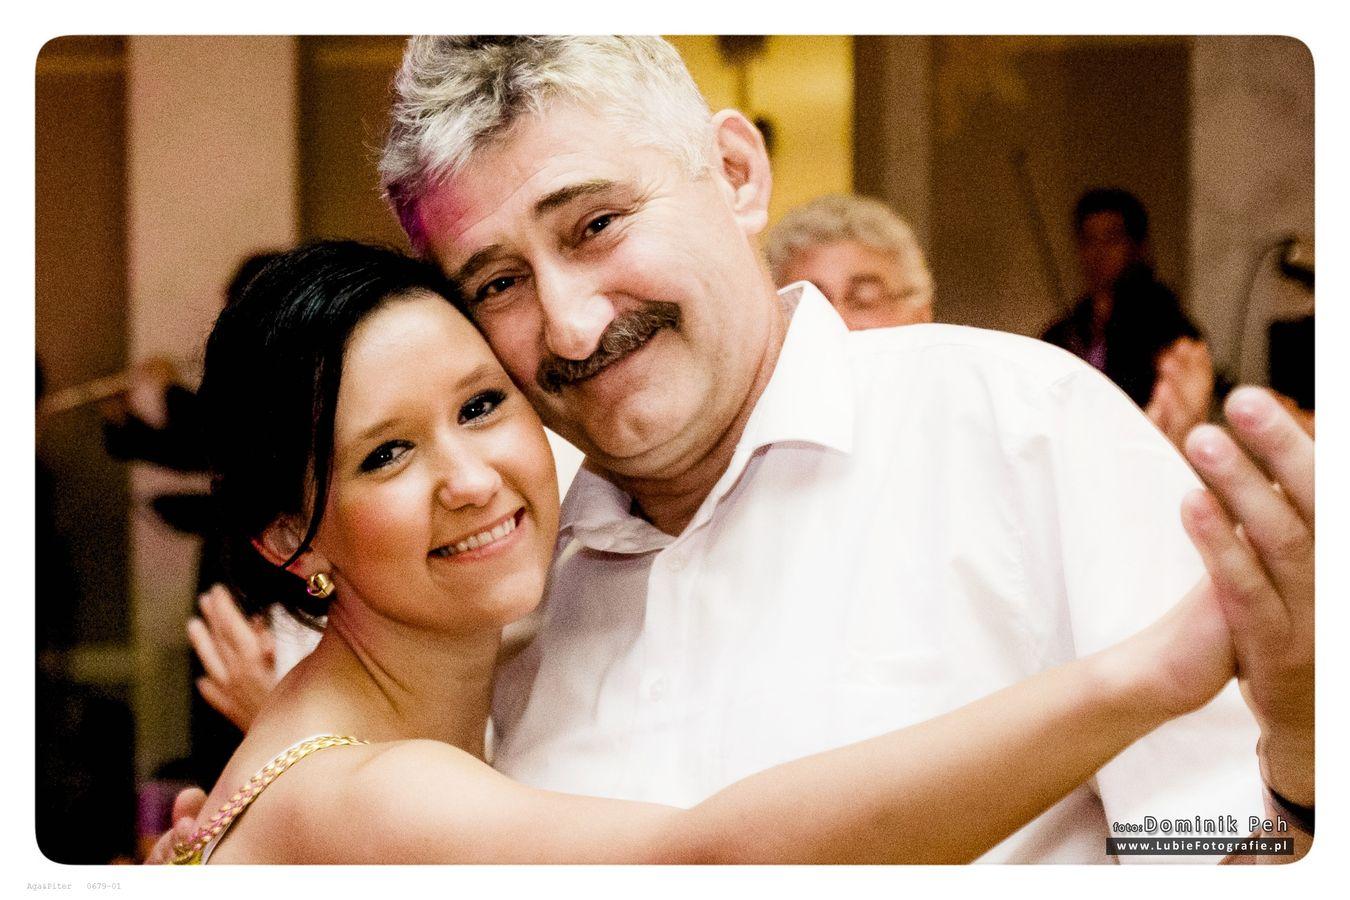 Agnieszka&Piotr  0068